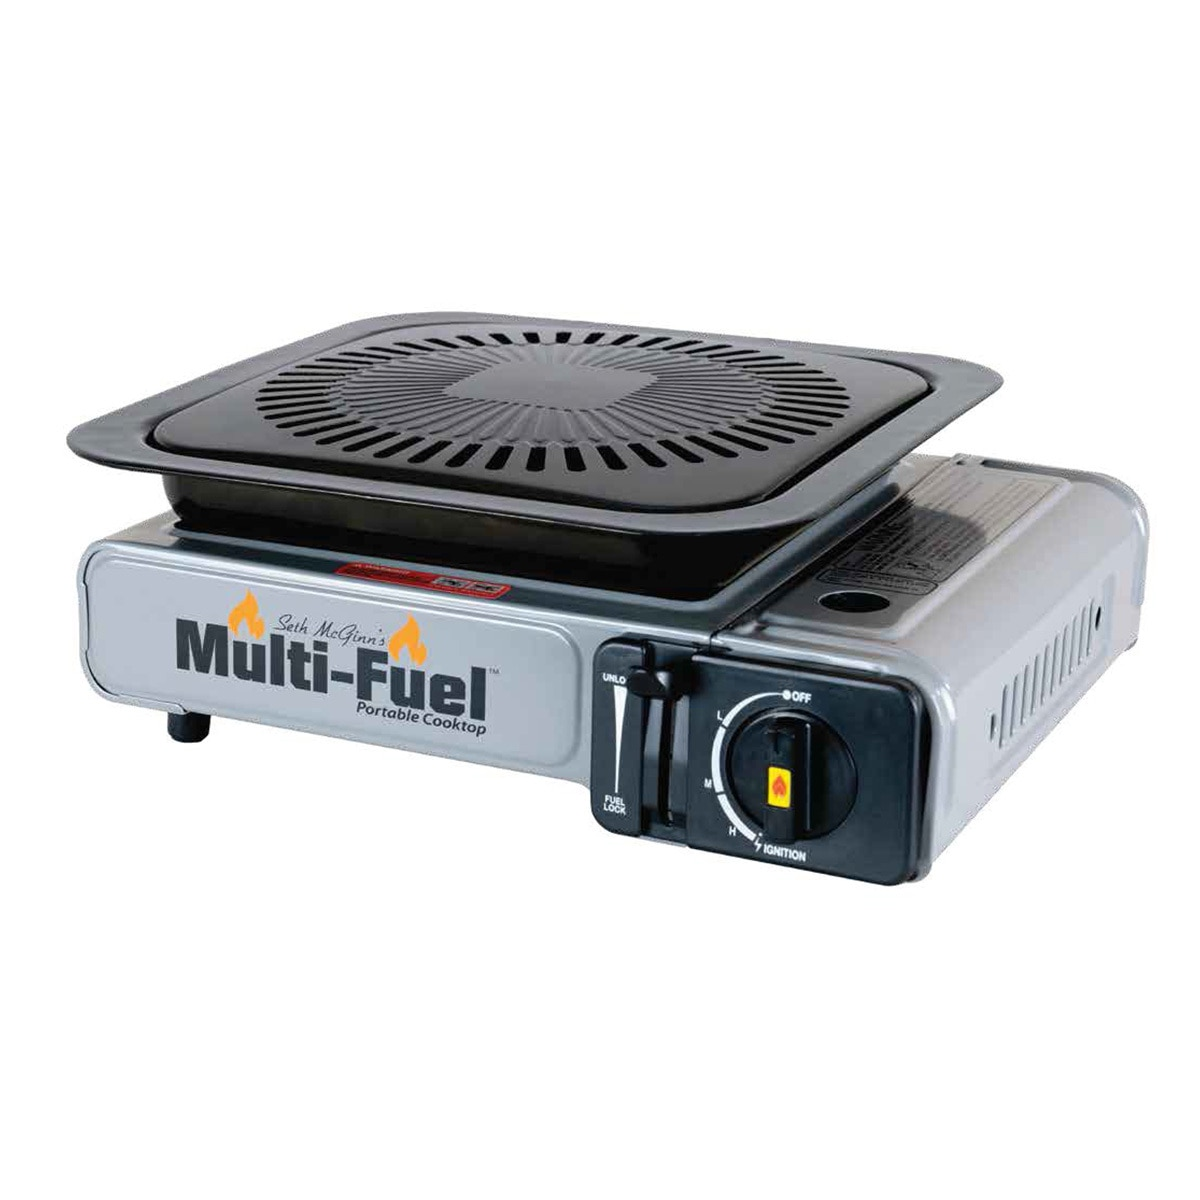 Portable Conversion Grill & Multi-Fuel Portable Cooktop